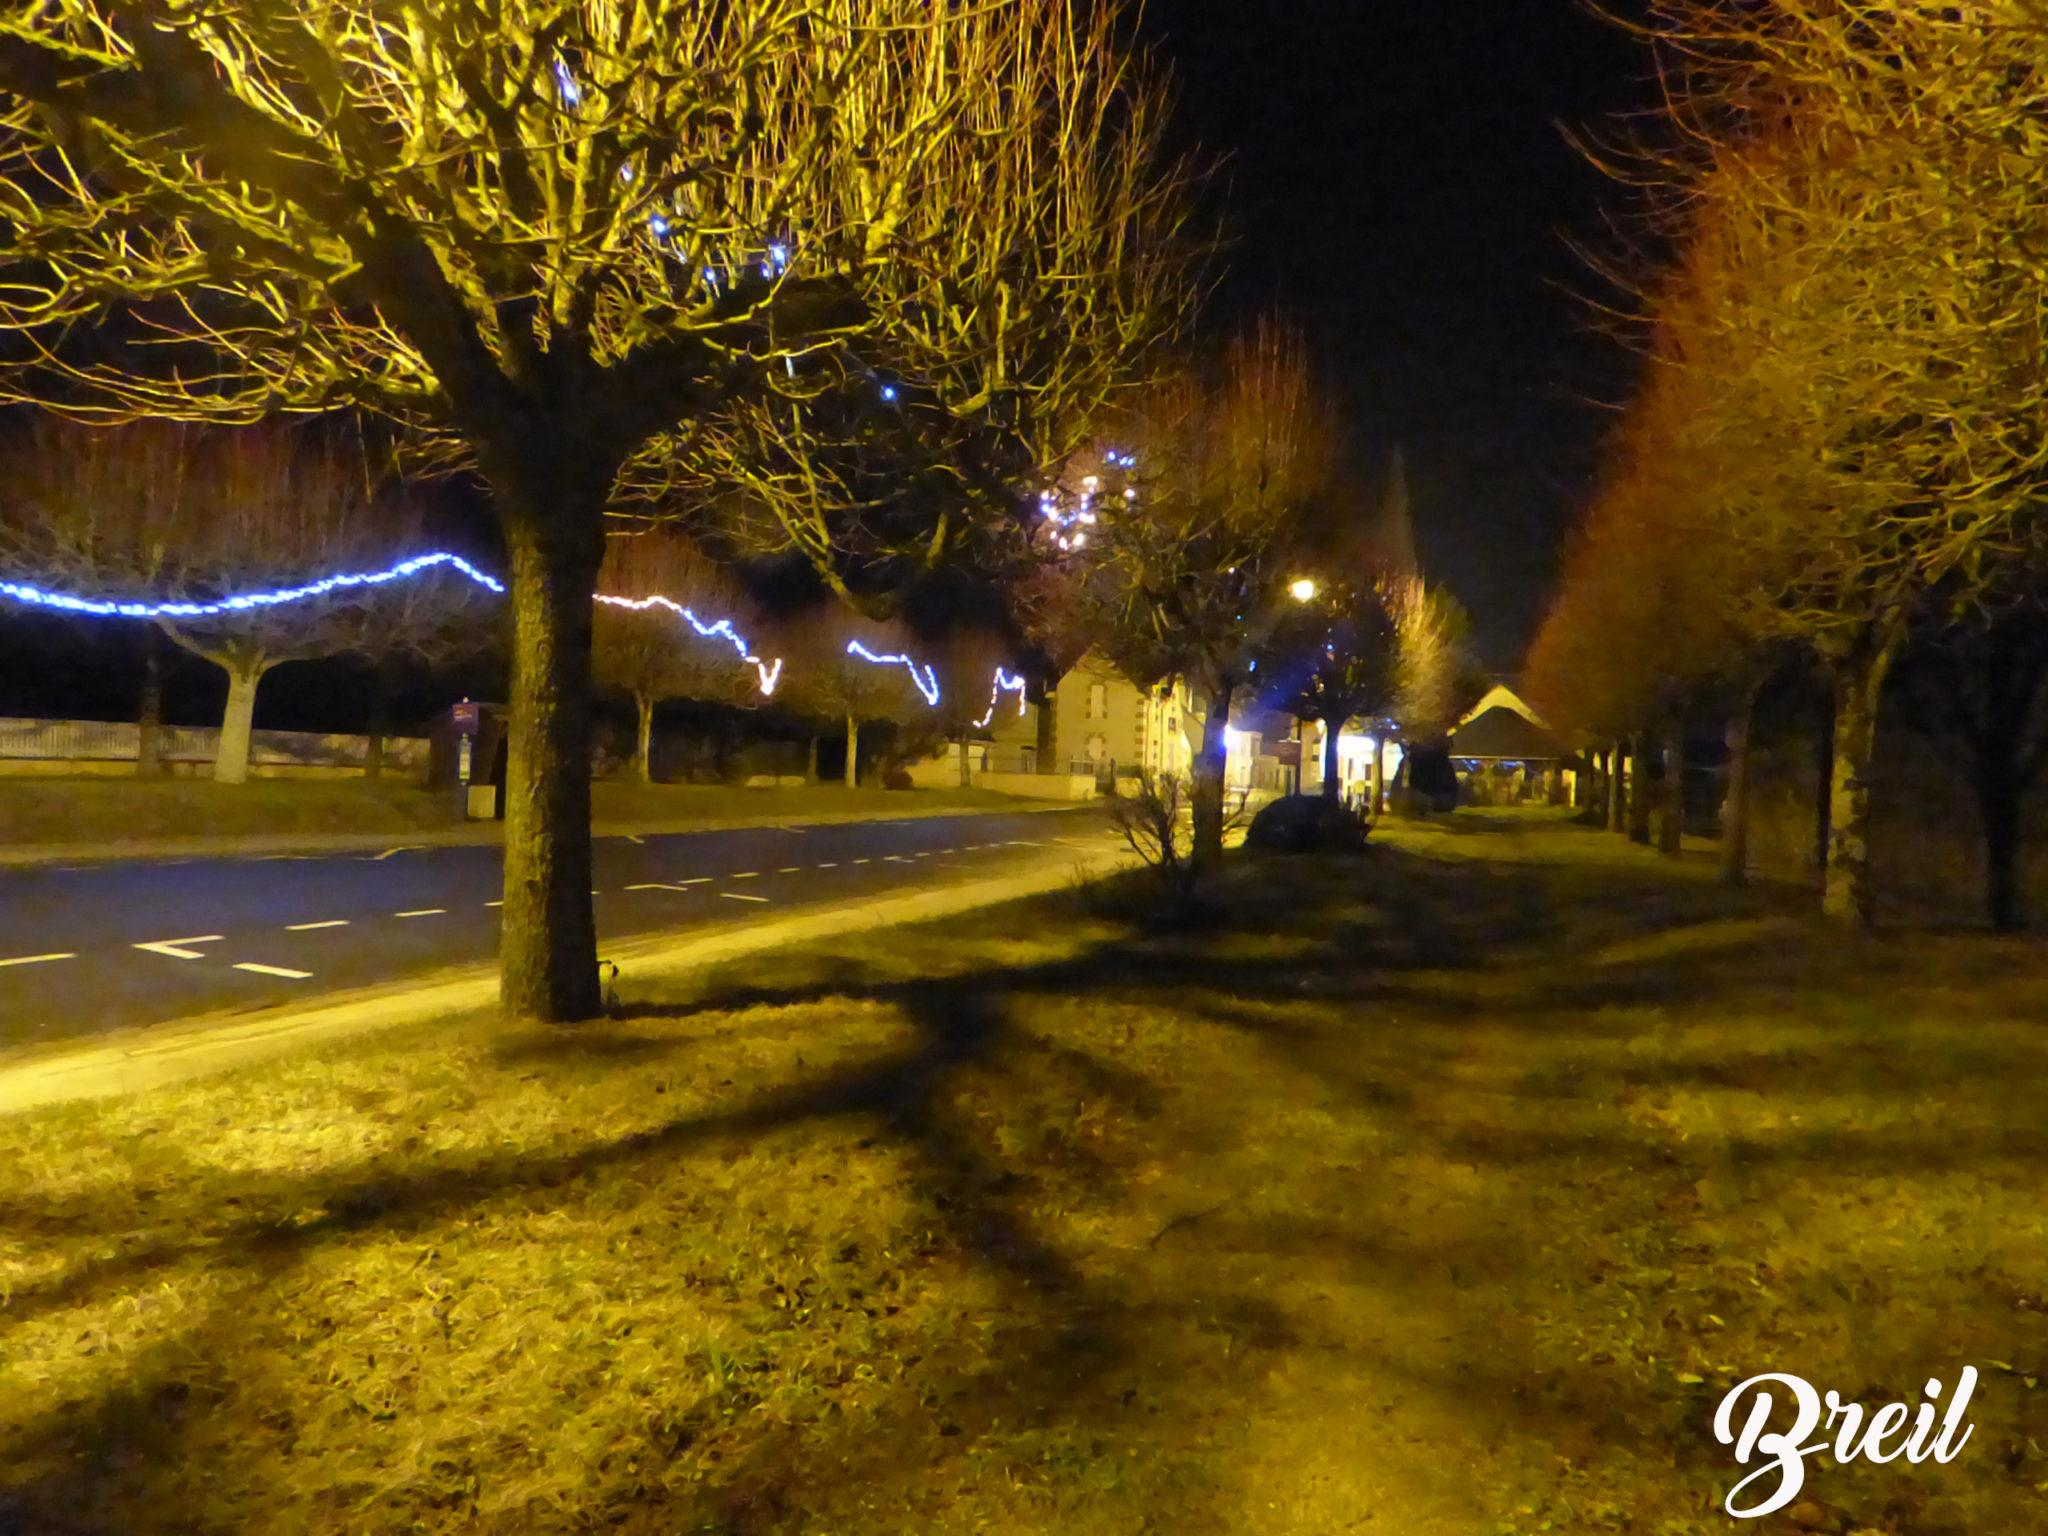 Illuminations Breil